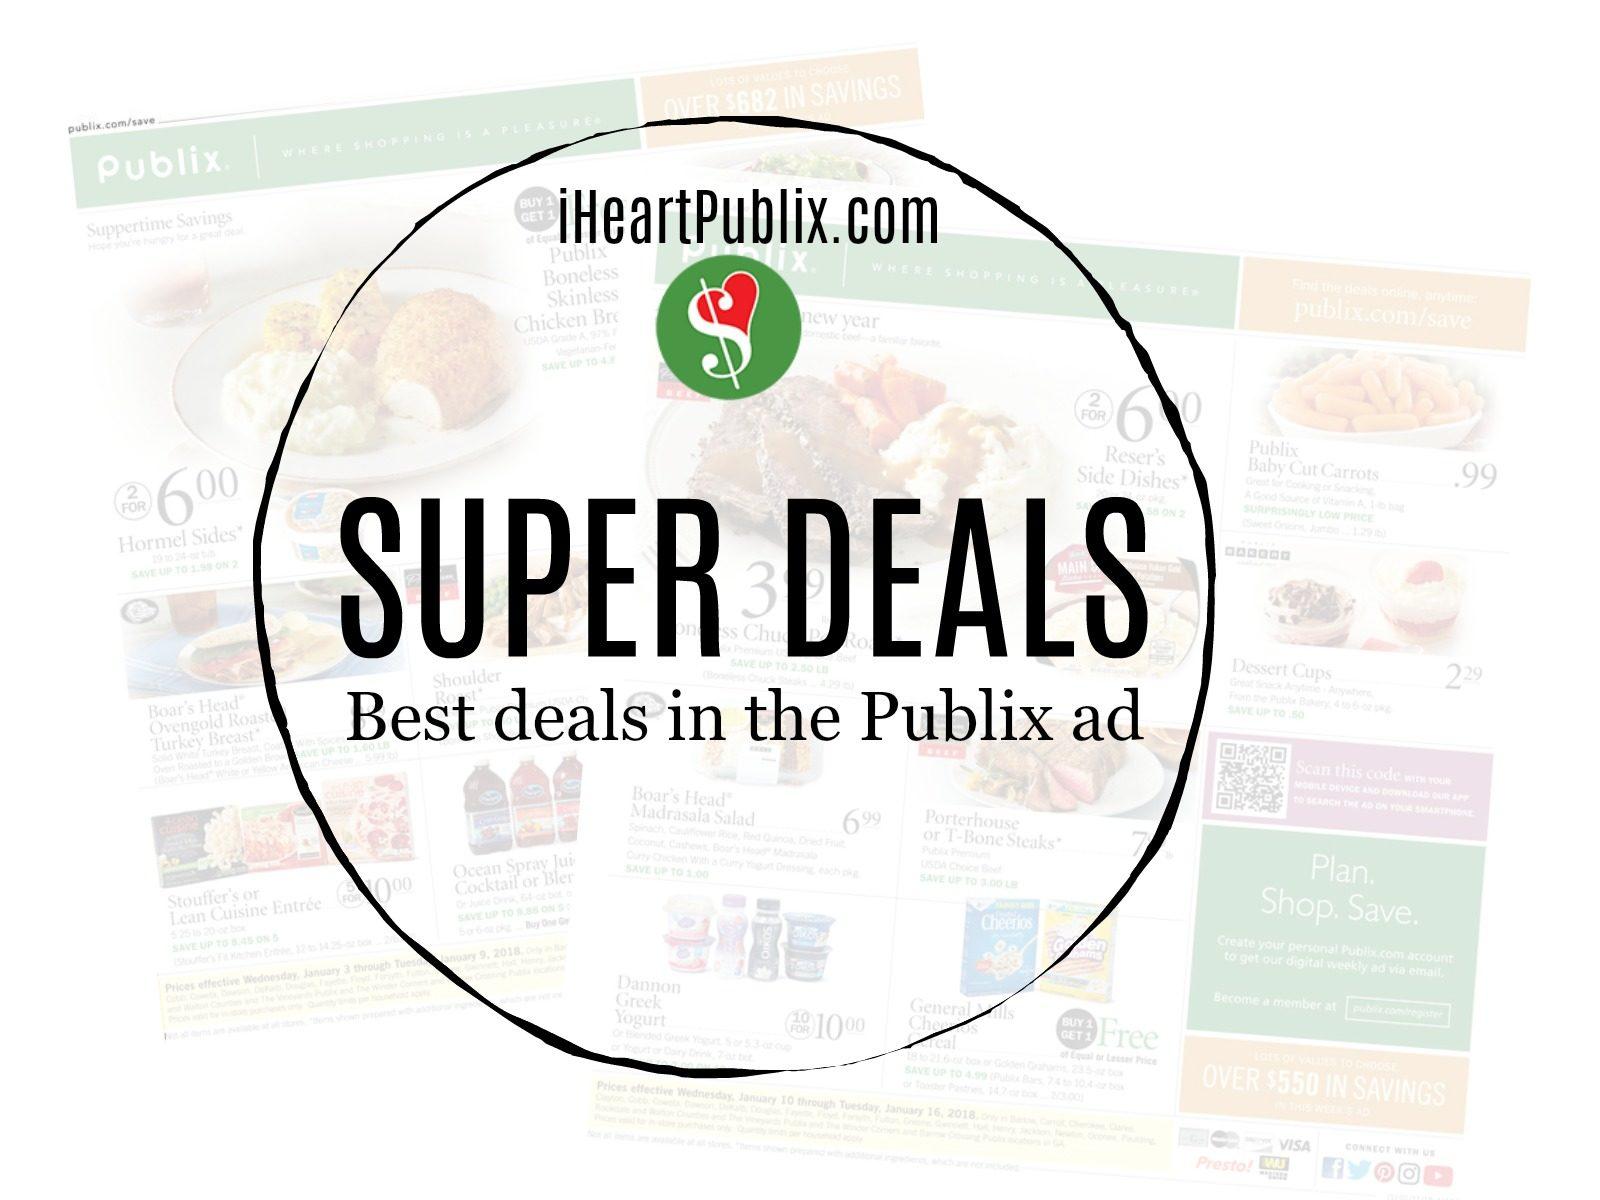 Publix Super Deals Week Of 4/22 - 4/24 (4/22 - 4/23 For Some) - SHORT AD